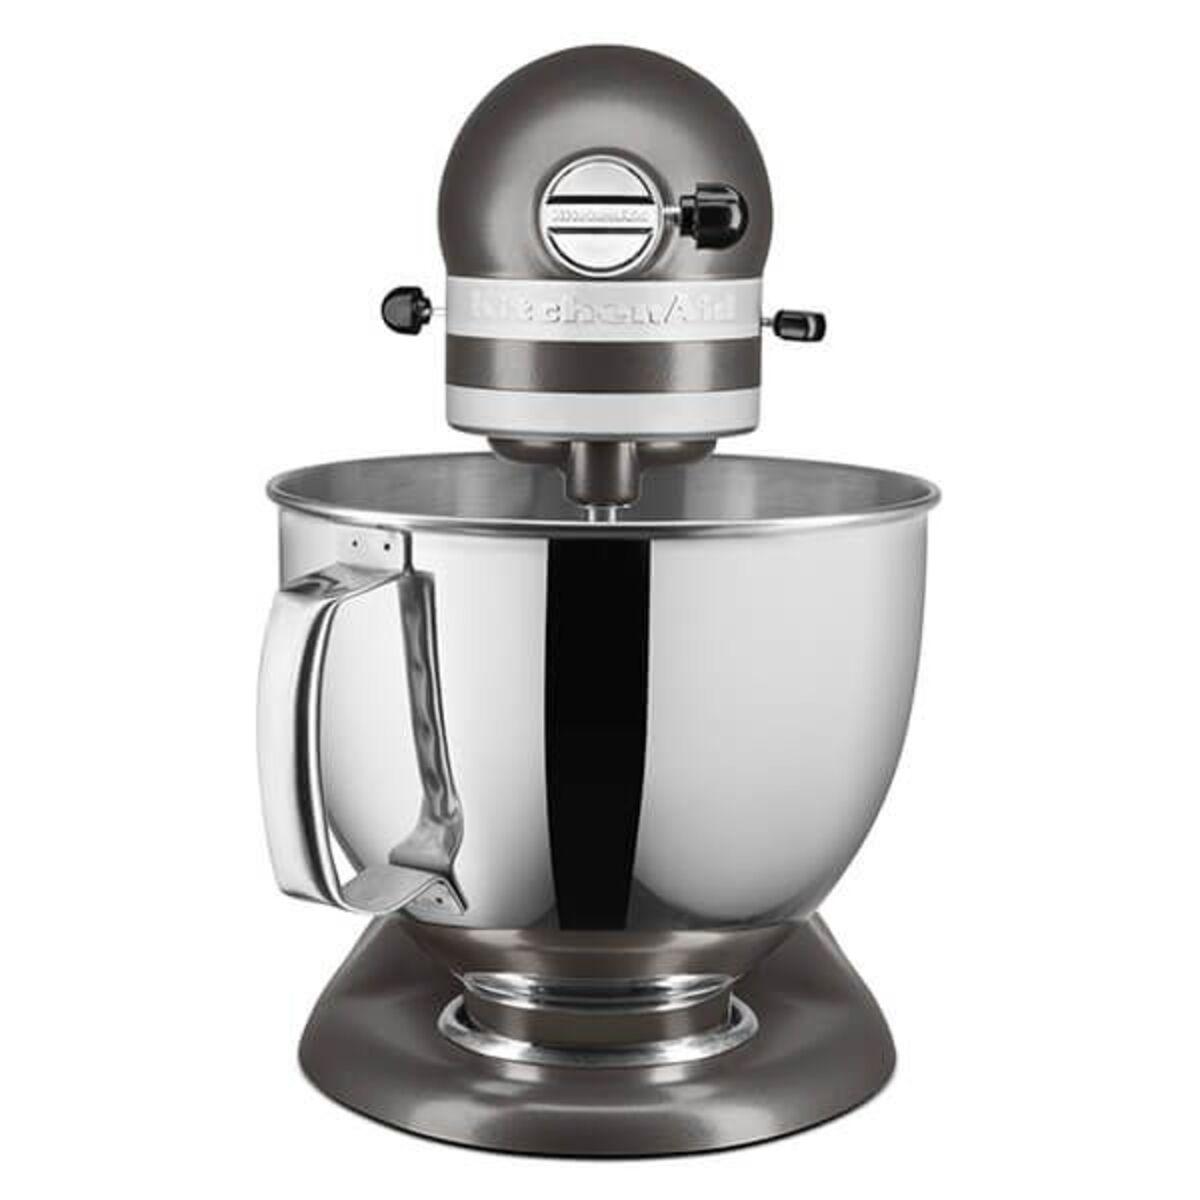 KitchenAid 5KSM125BFG 4.8 Litre Artisan Stand Mixer, Matte Grey